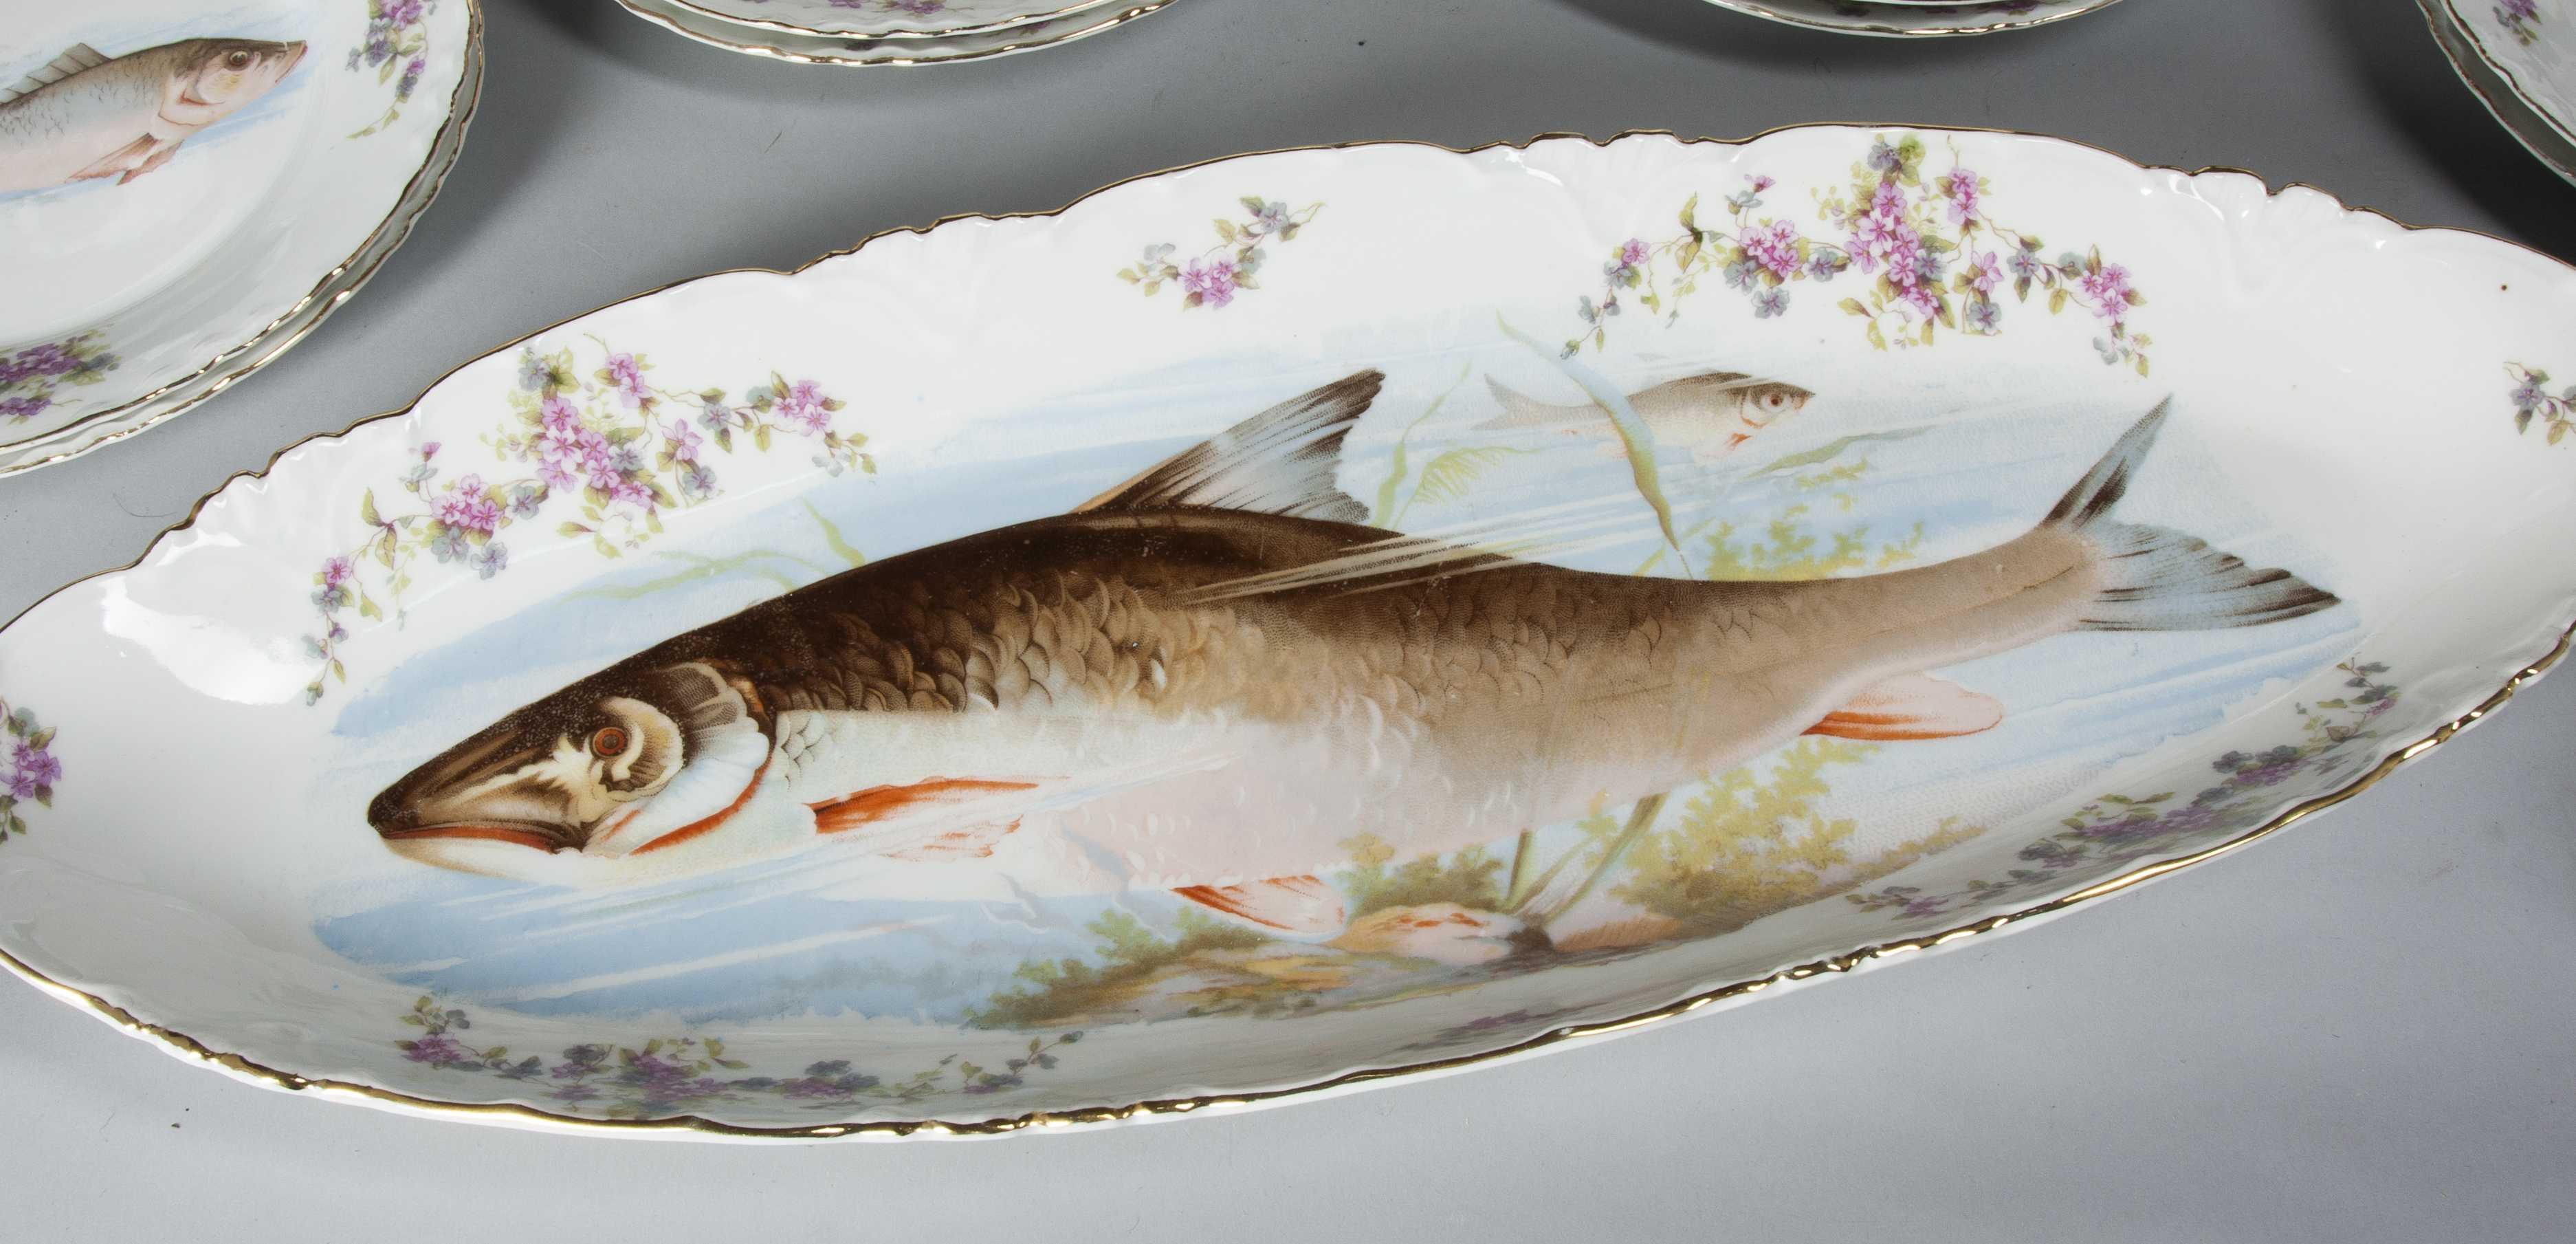 & Antique Carlsbad Austrian Game Fish Set